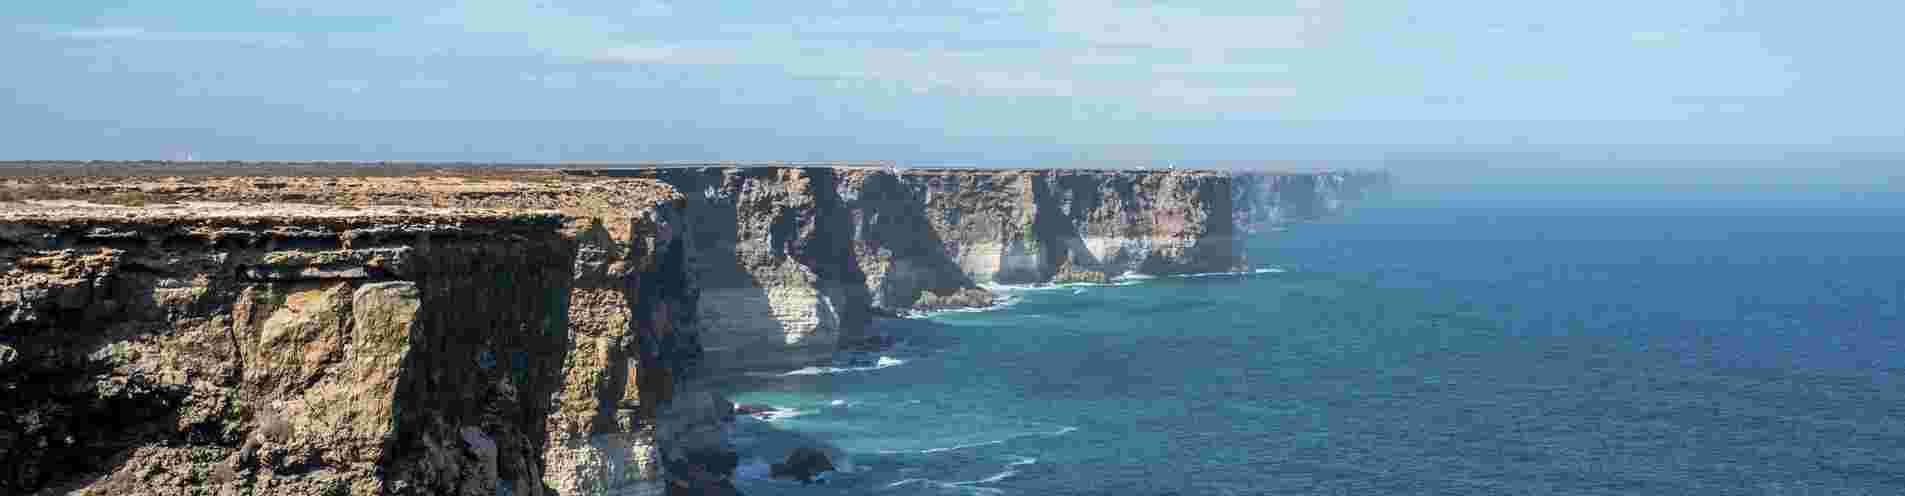 South Australia header image